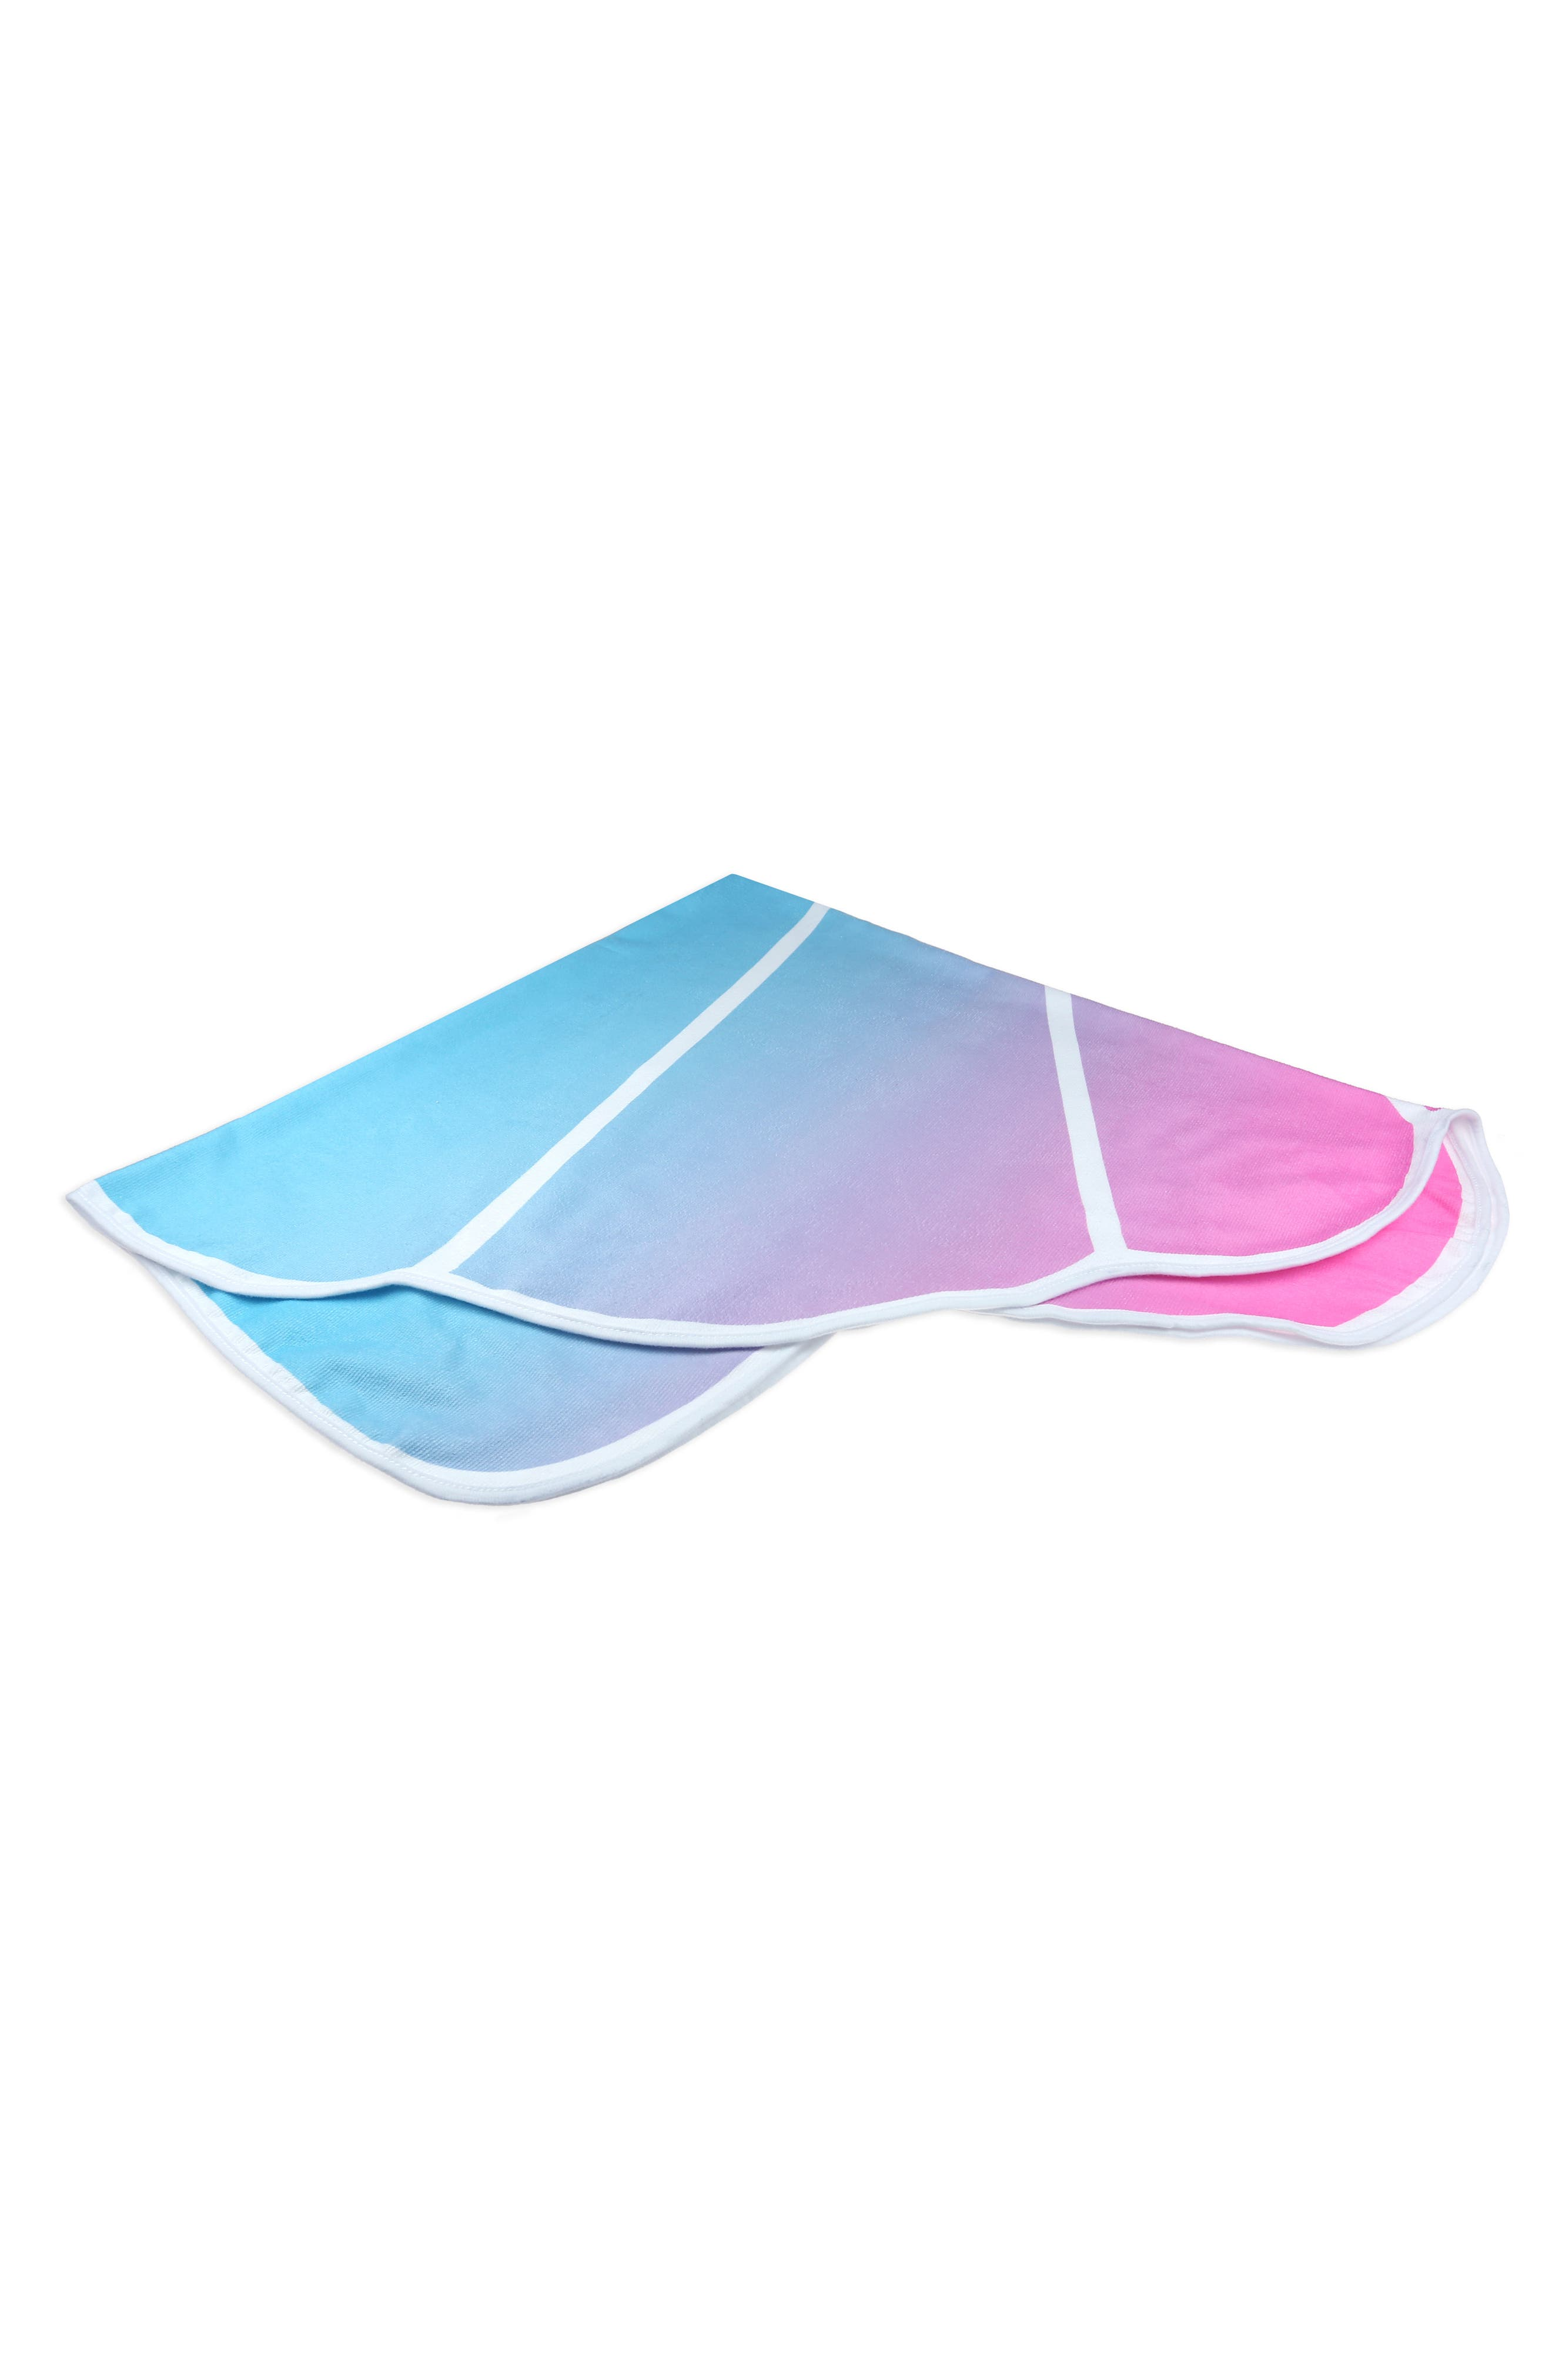 Seashell Towel,                             Alternate thumbnail 6, color,                             475